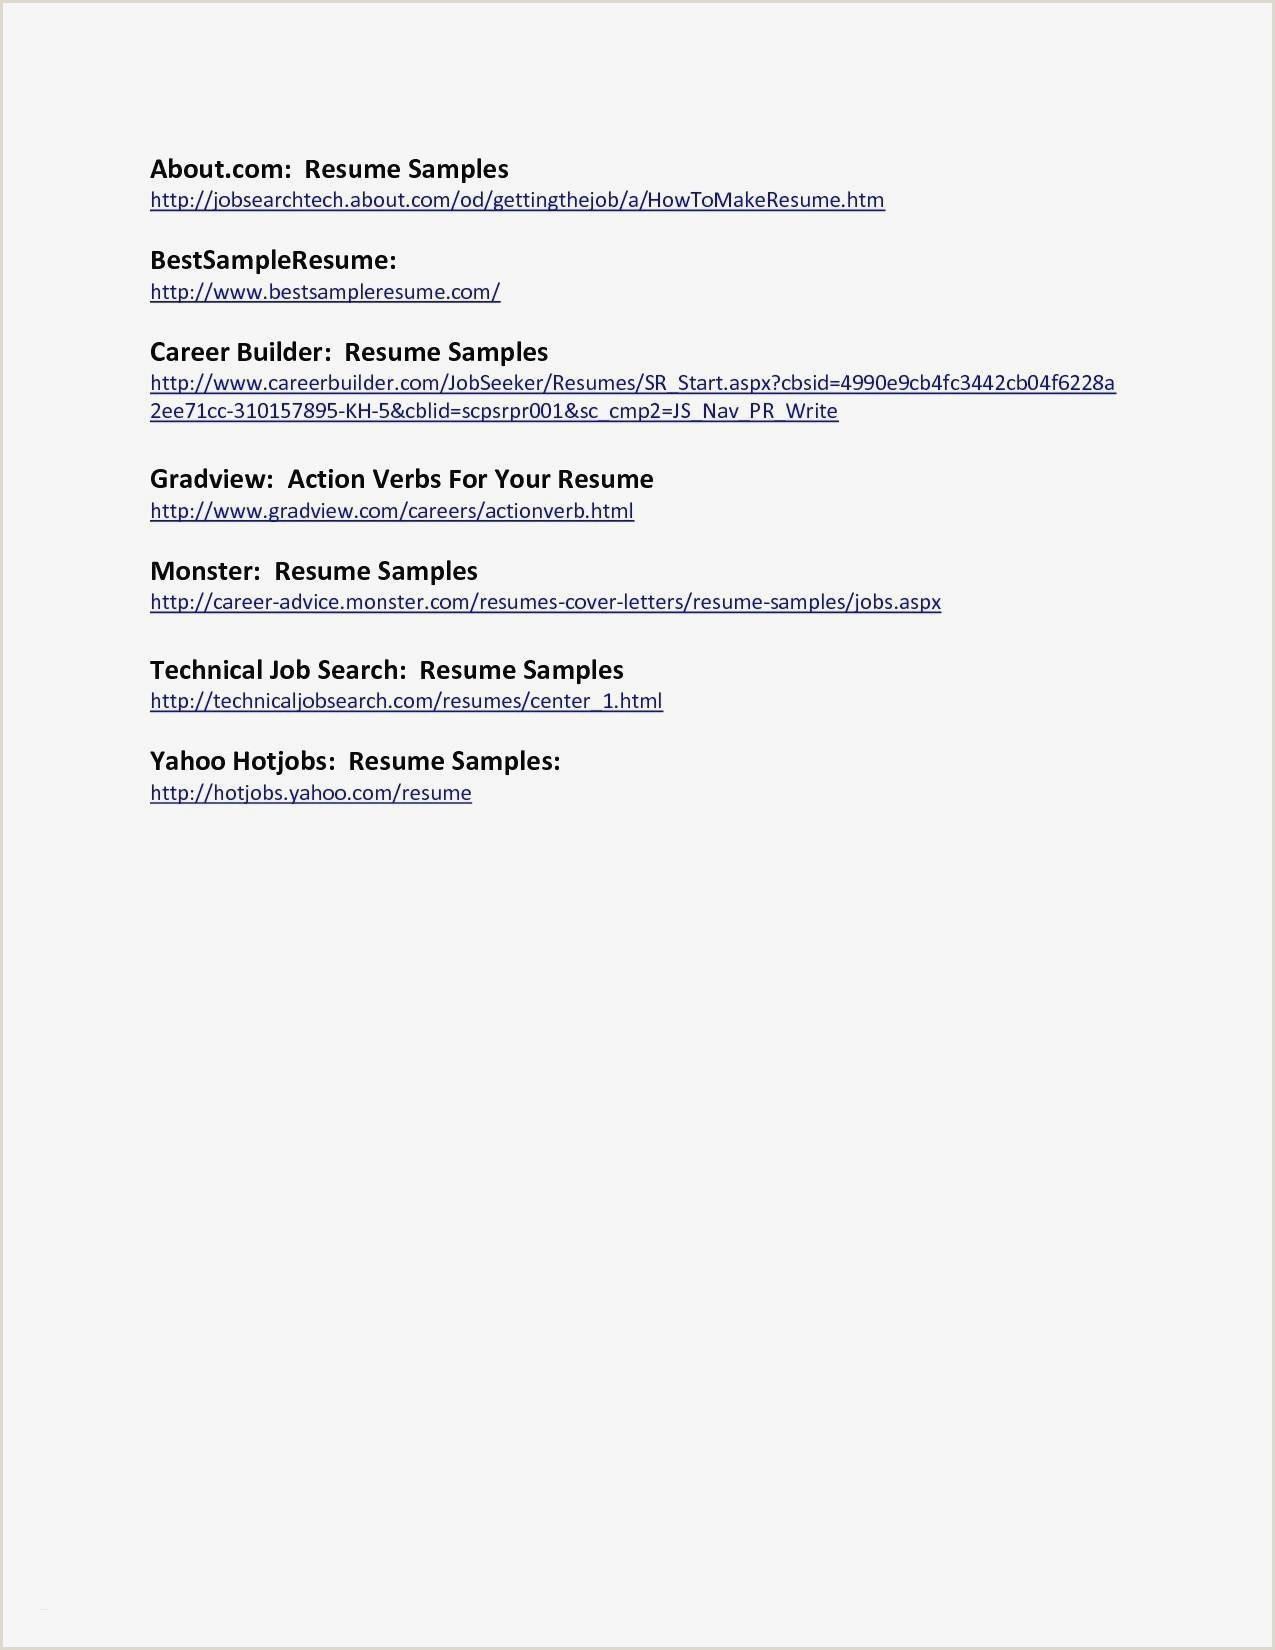 Standard Cv format In Pdf Puter Technician Resume Sample Examples Sample Basic